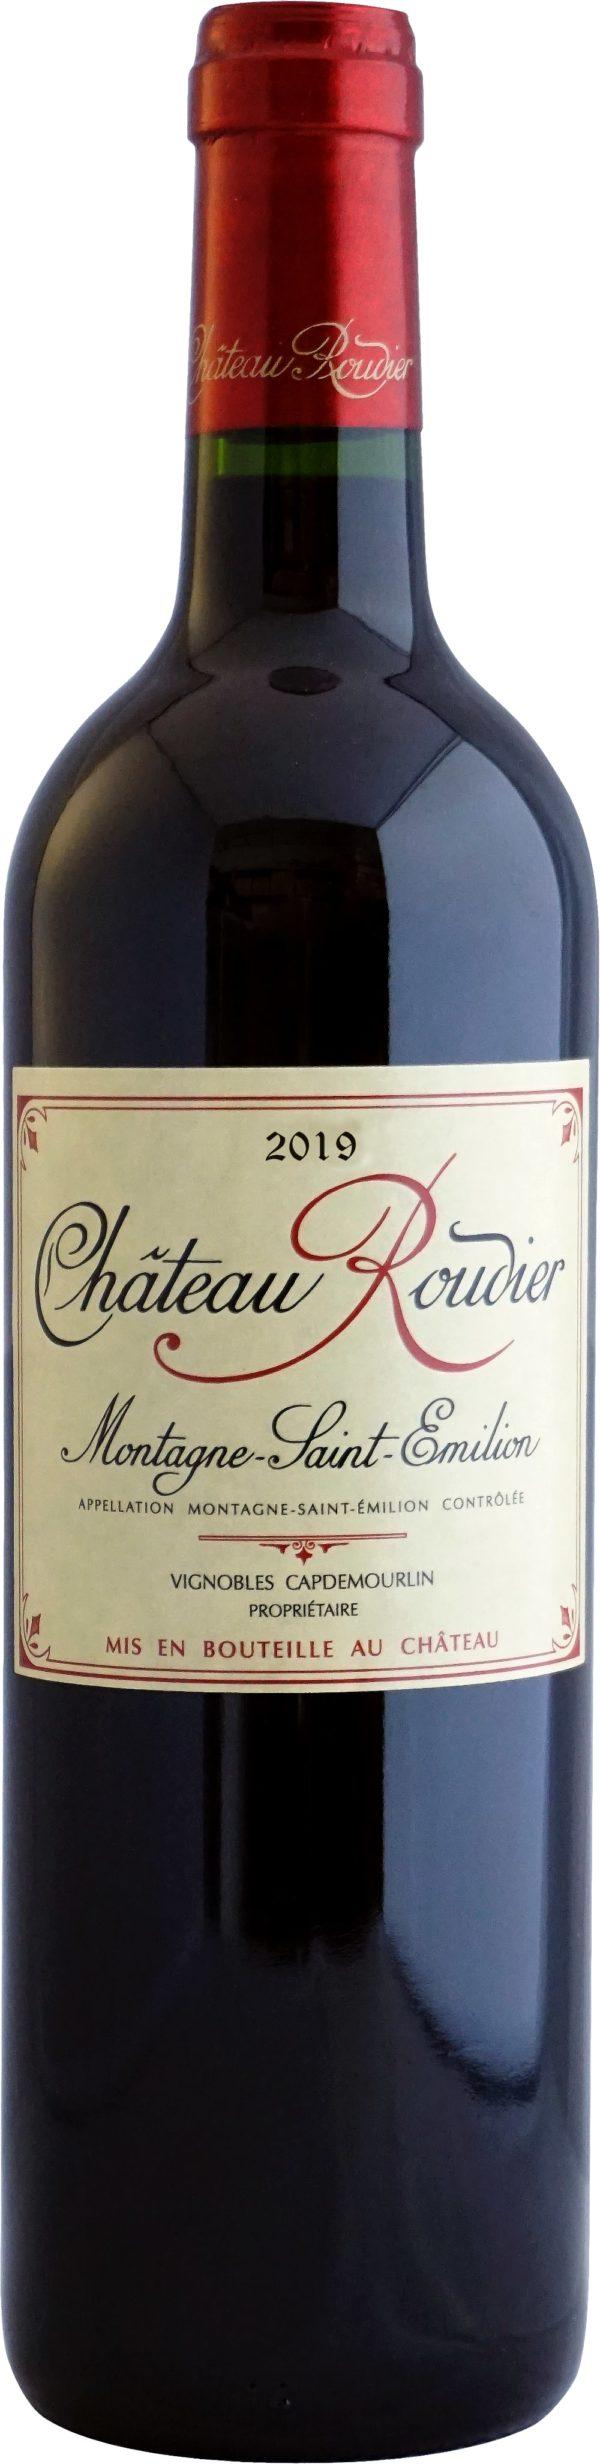 Château Roudier 2019